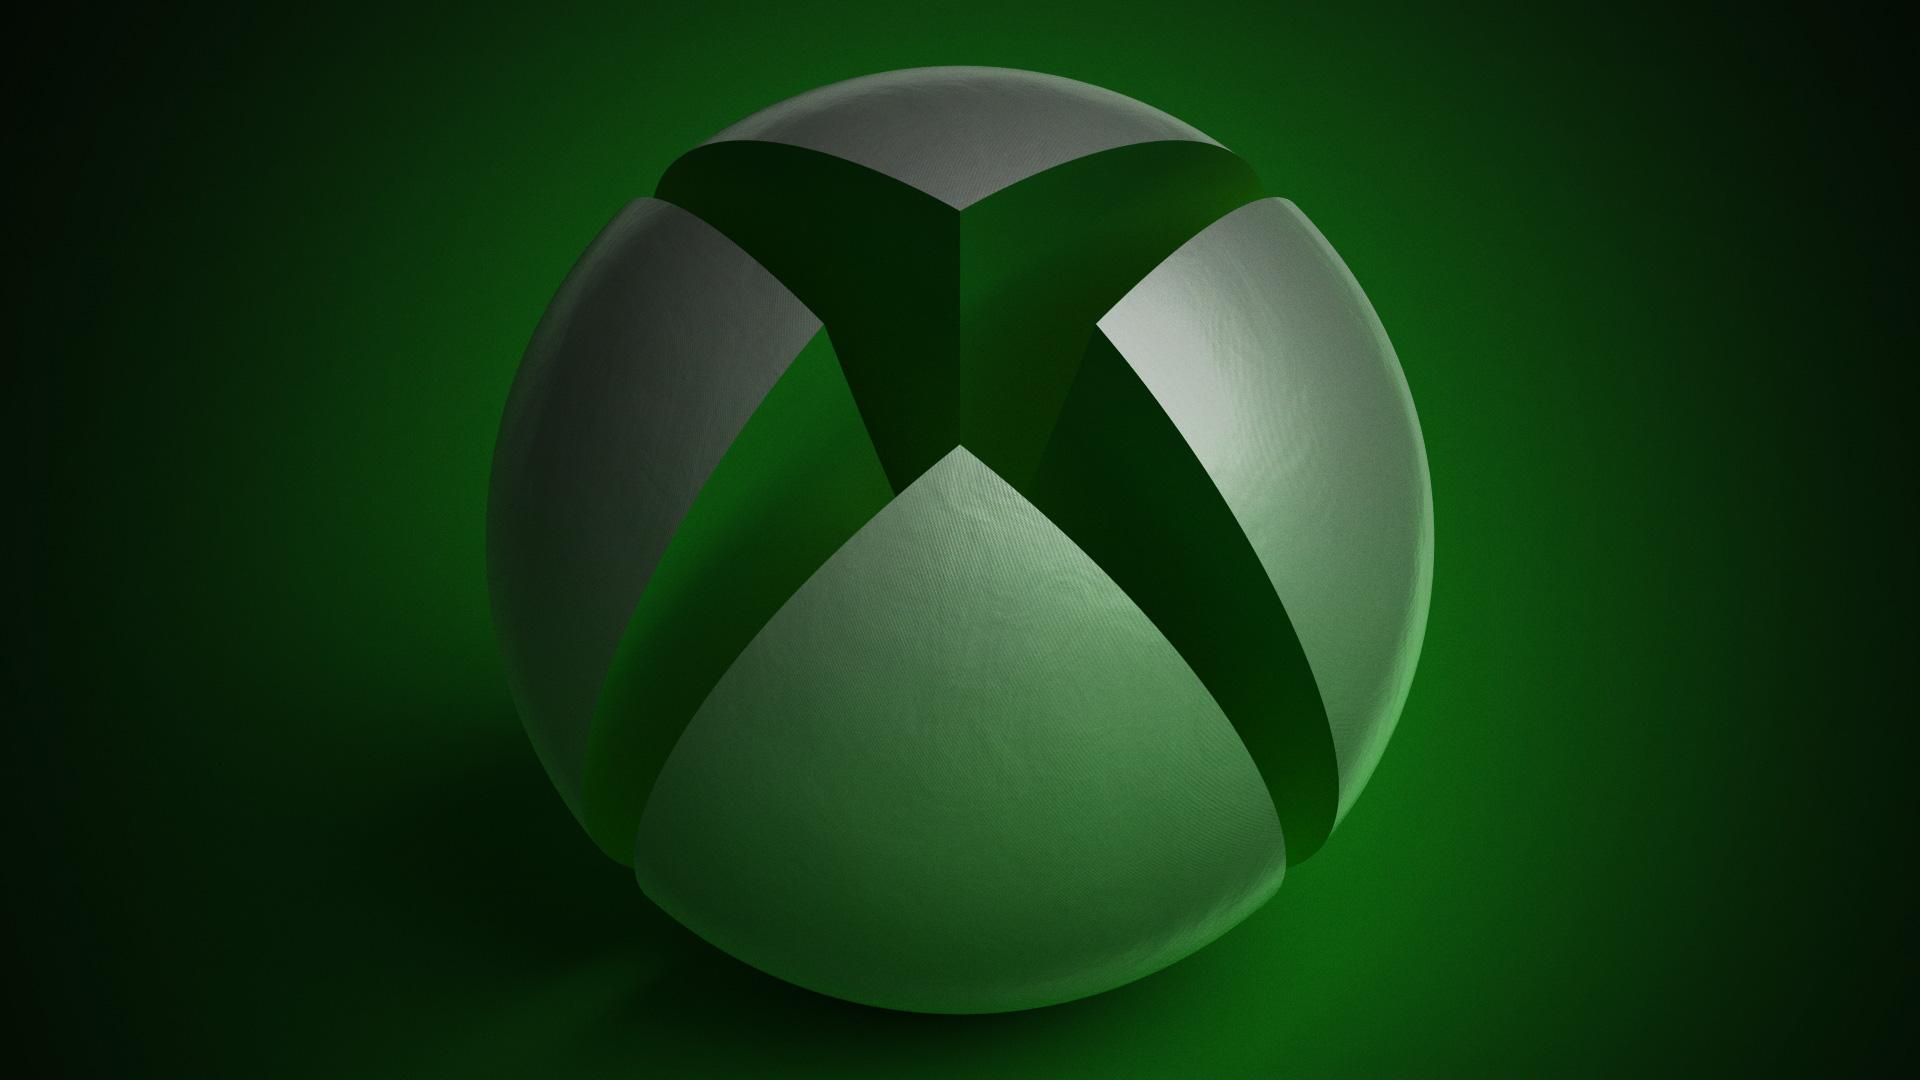 Black Crown Wallpaper X1bg Giant Xbox Sphere Green Dark Martin Crownover